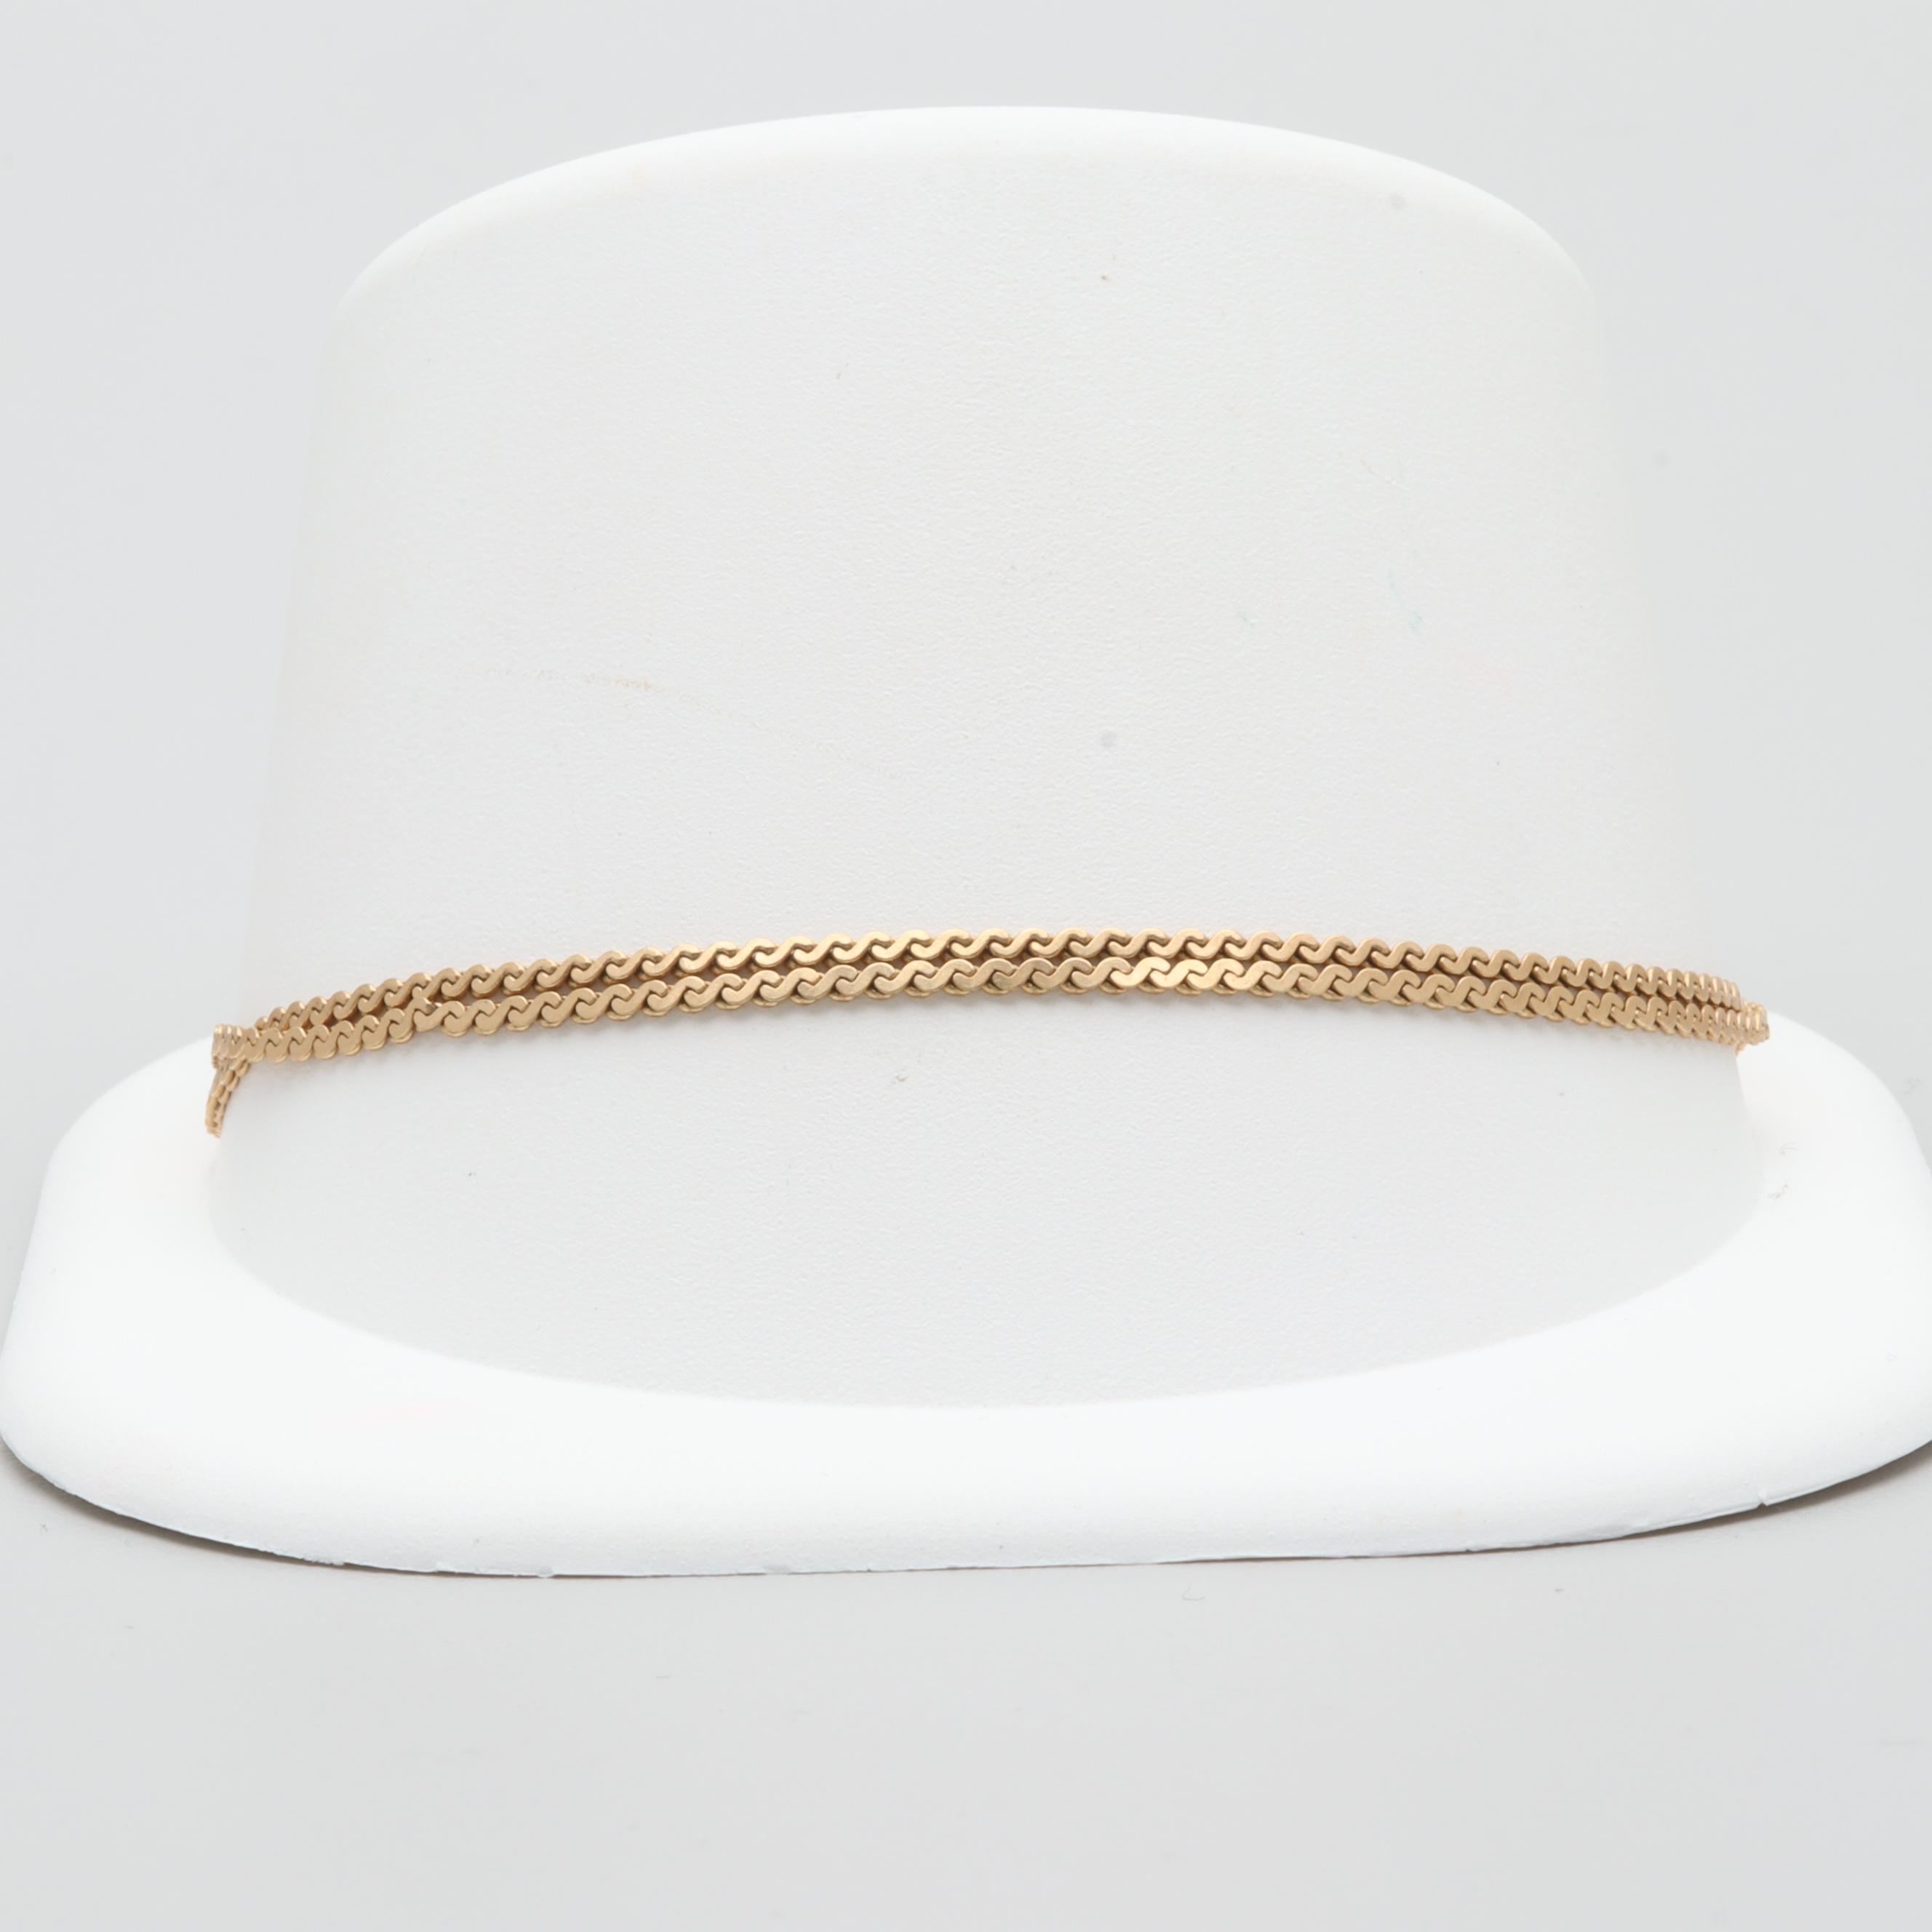 14K Yellow Gold Serpentine Chain Bracelet